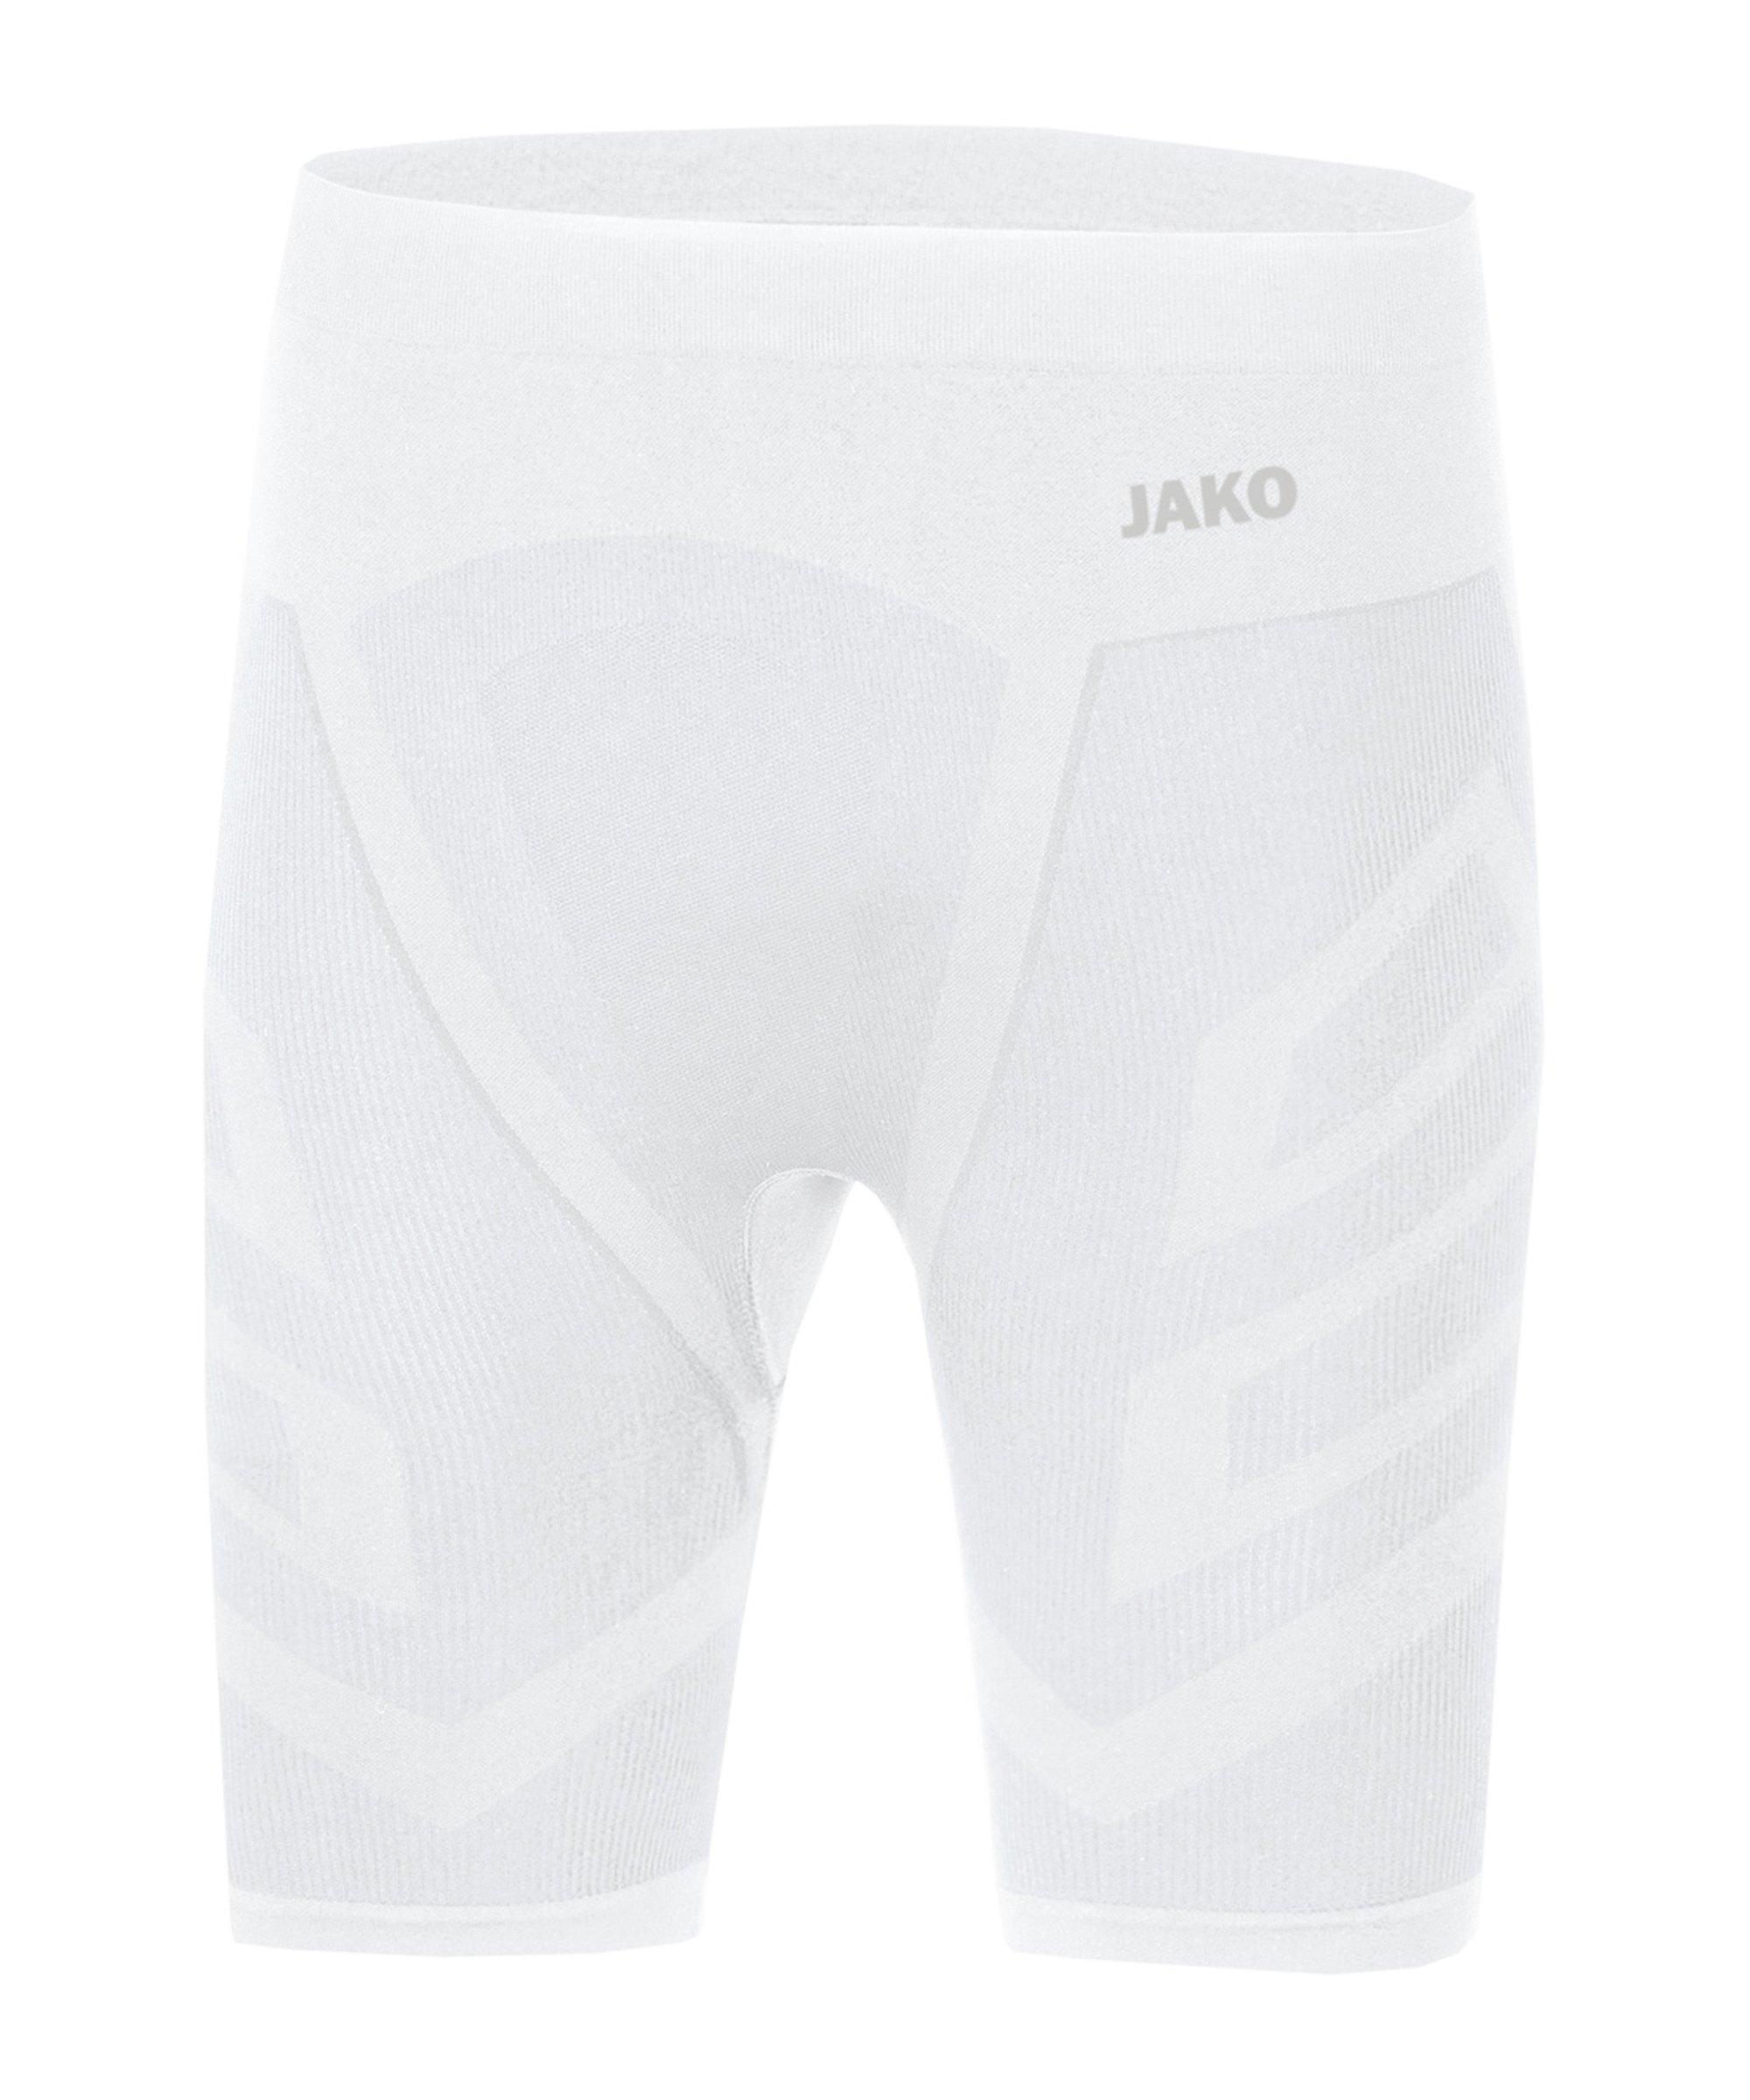 JAKO Comfort 2.0 Tight kurz Weiss F00 - weiss